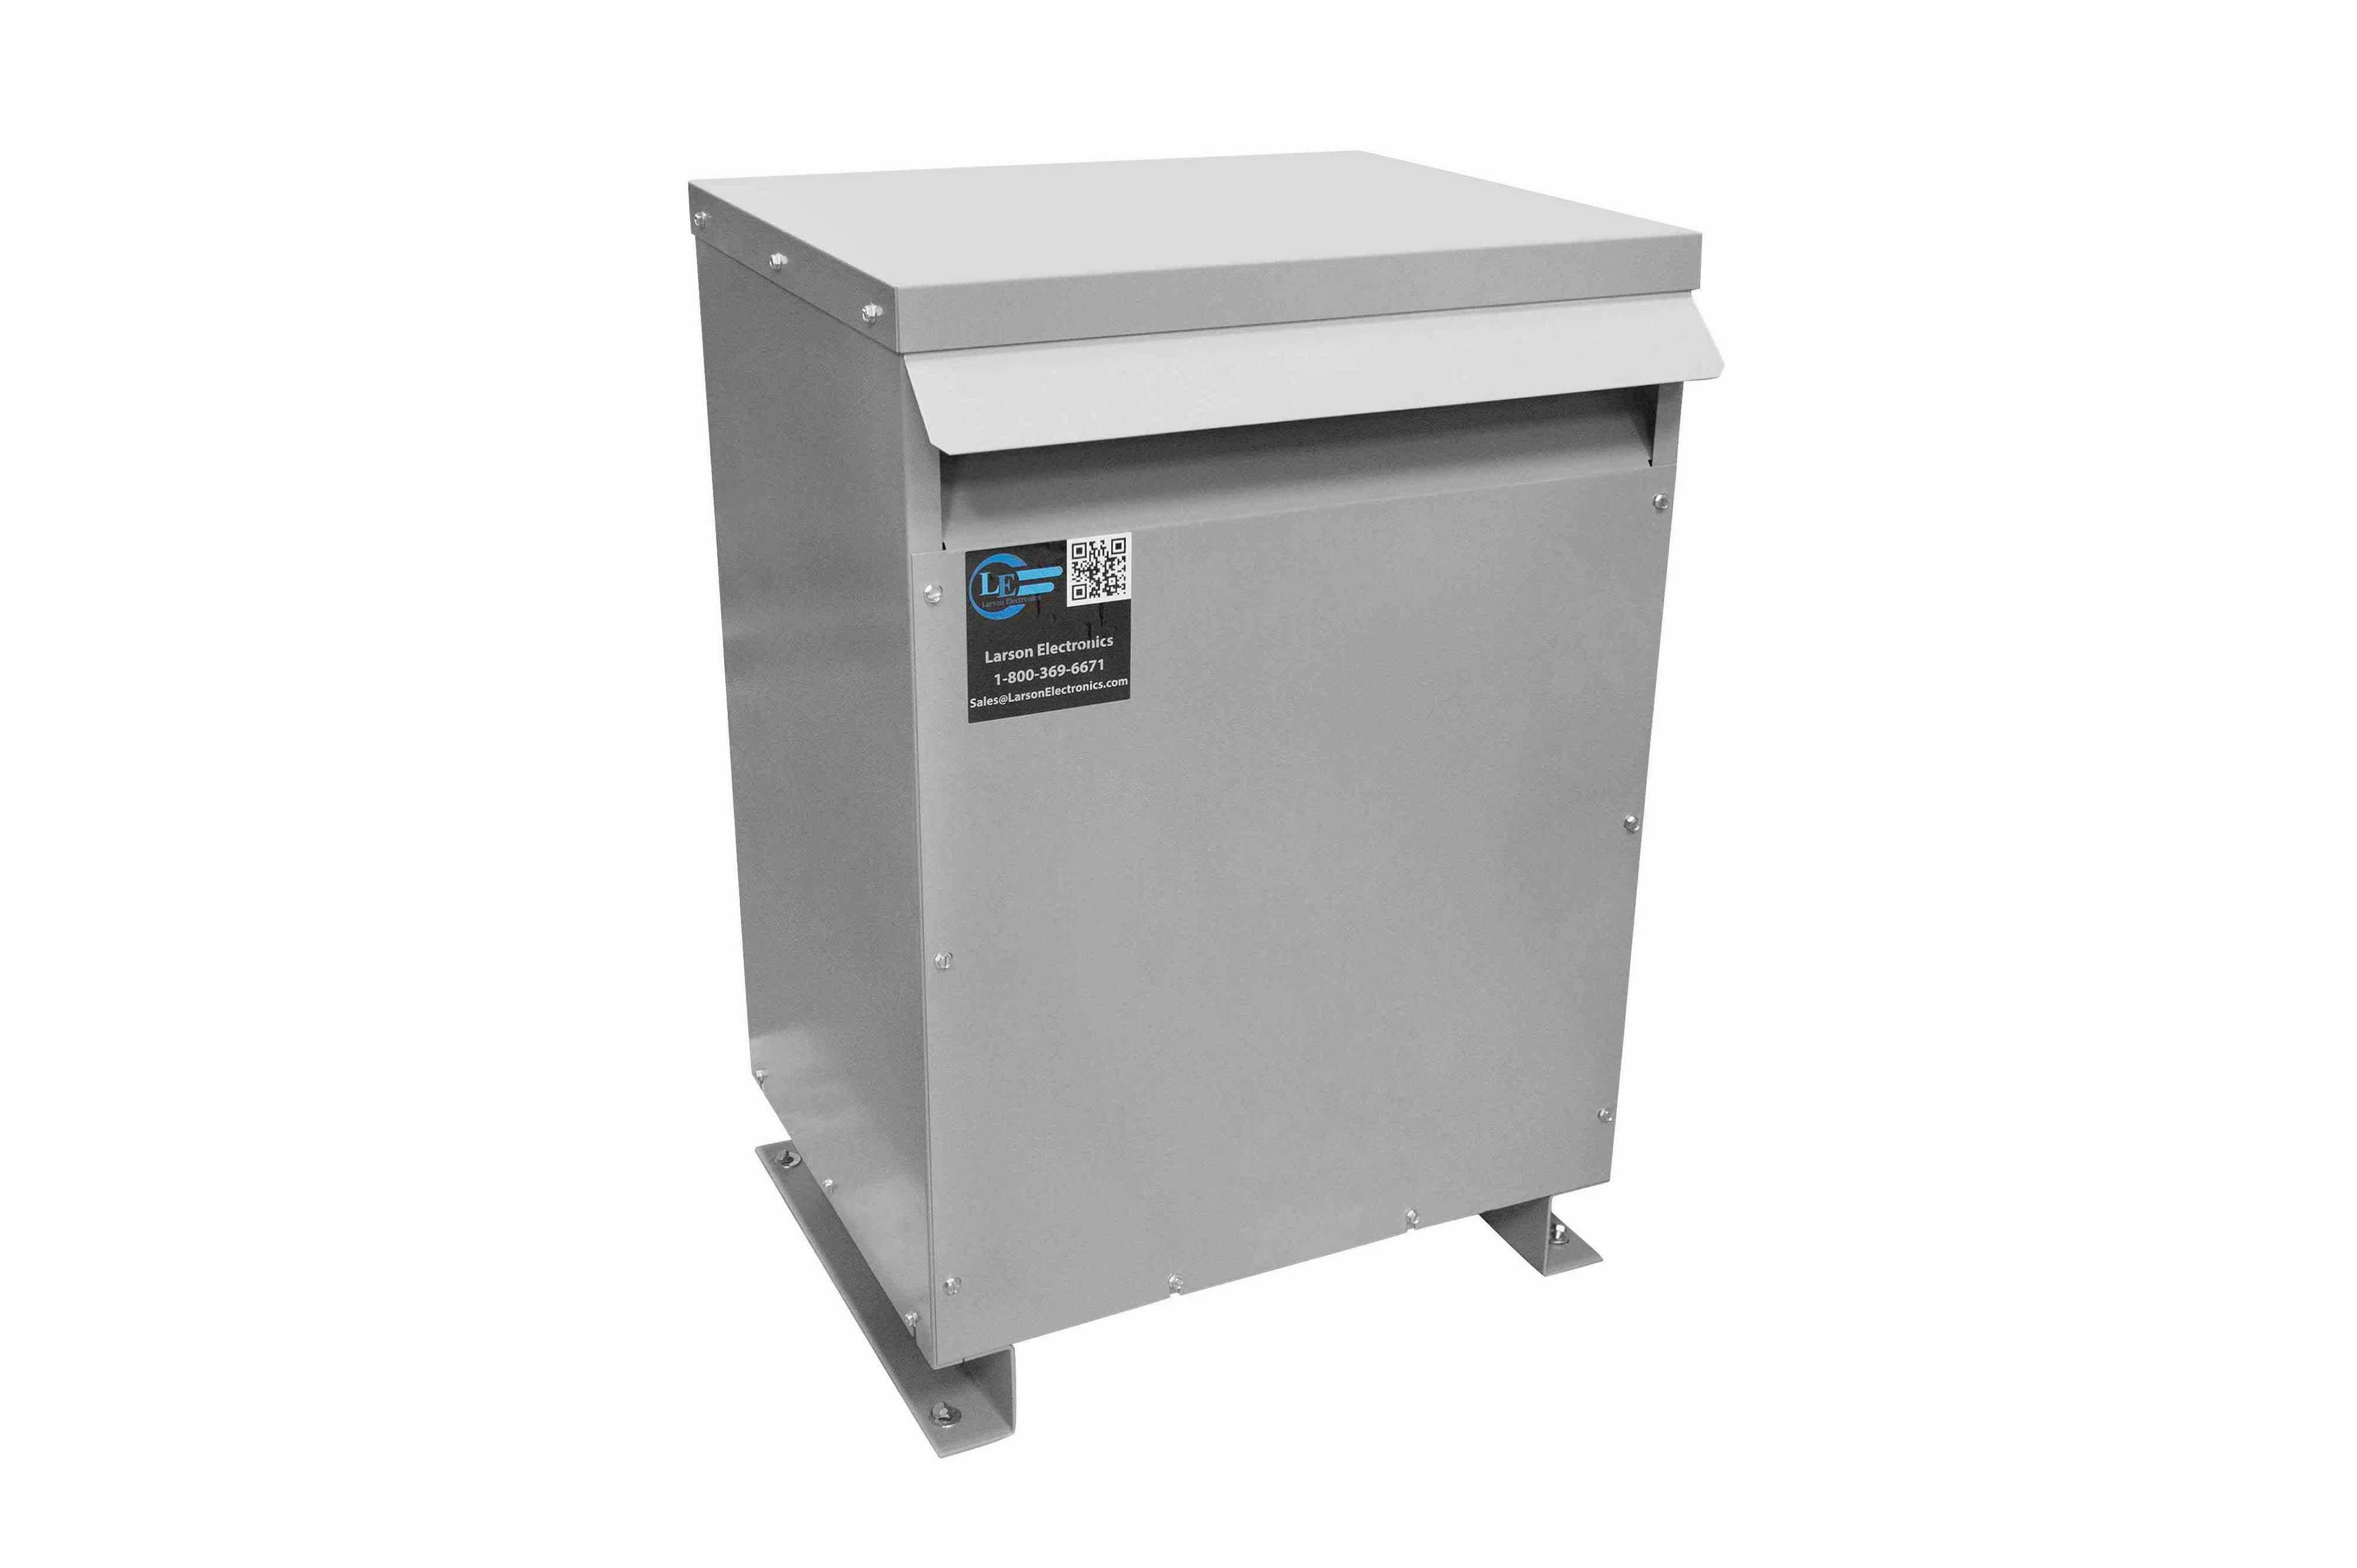 900 kVA 3PH Isolation Transformer, 575V Wye Primary, 208V Delta Secondary, N3R, Ventilated, 60 Hz